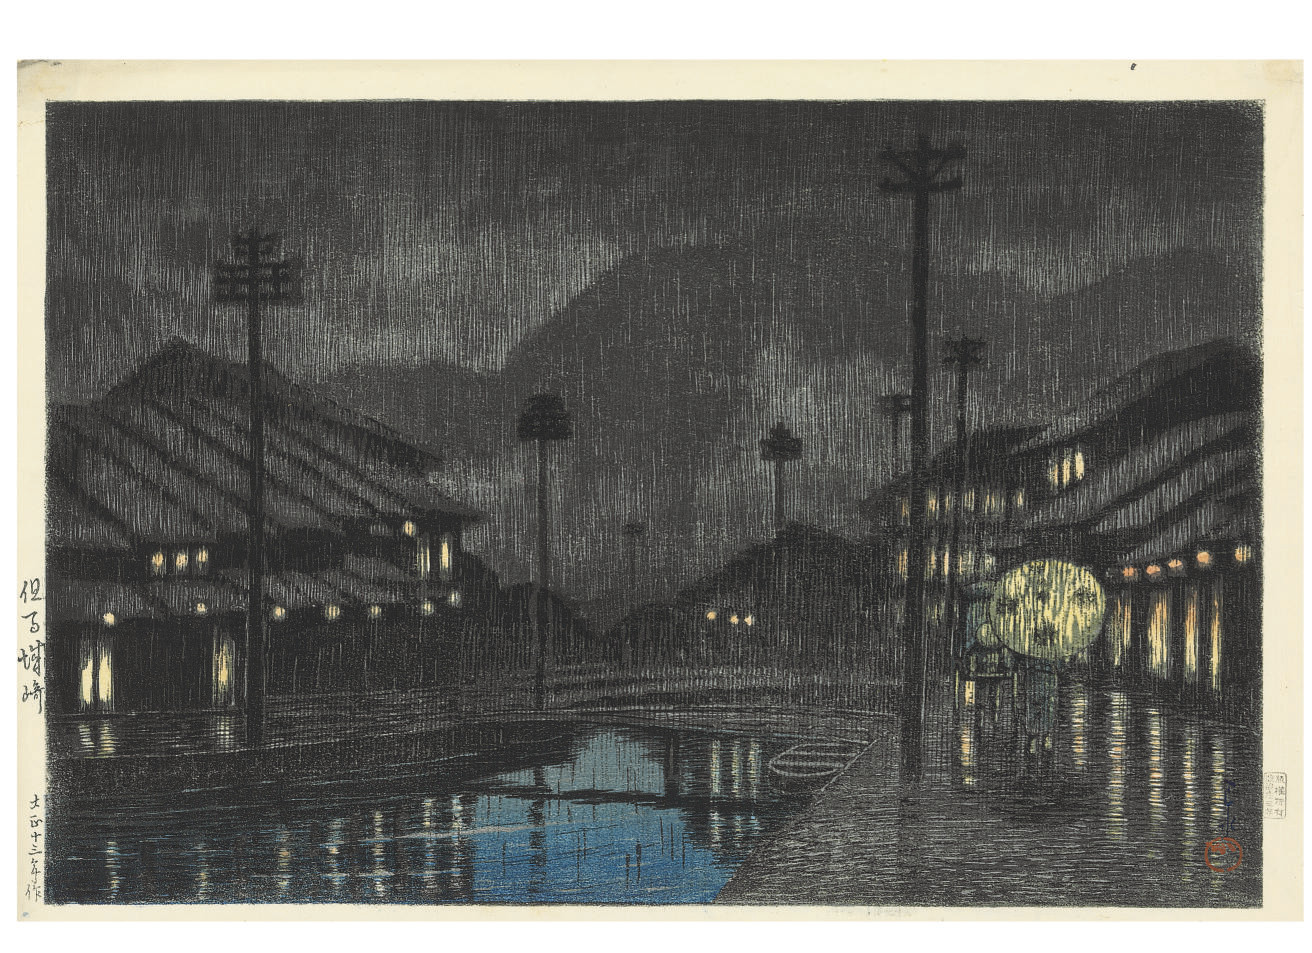 Tajima Shirozaki (Shirozaki, Tajima Province), from the series Tabimiyage daisanshu (Souvenirs of travel--third series), 1924